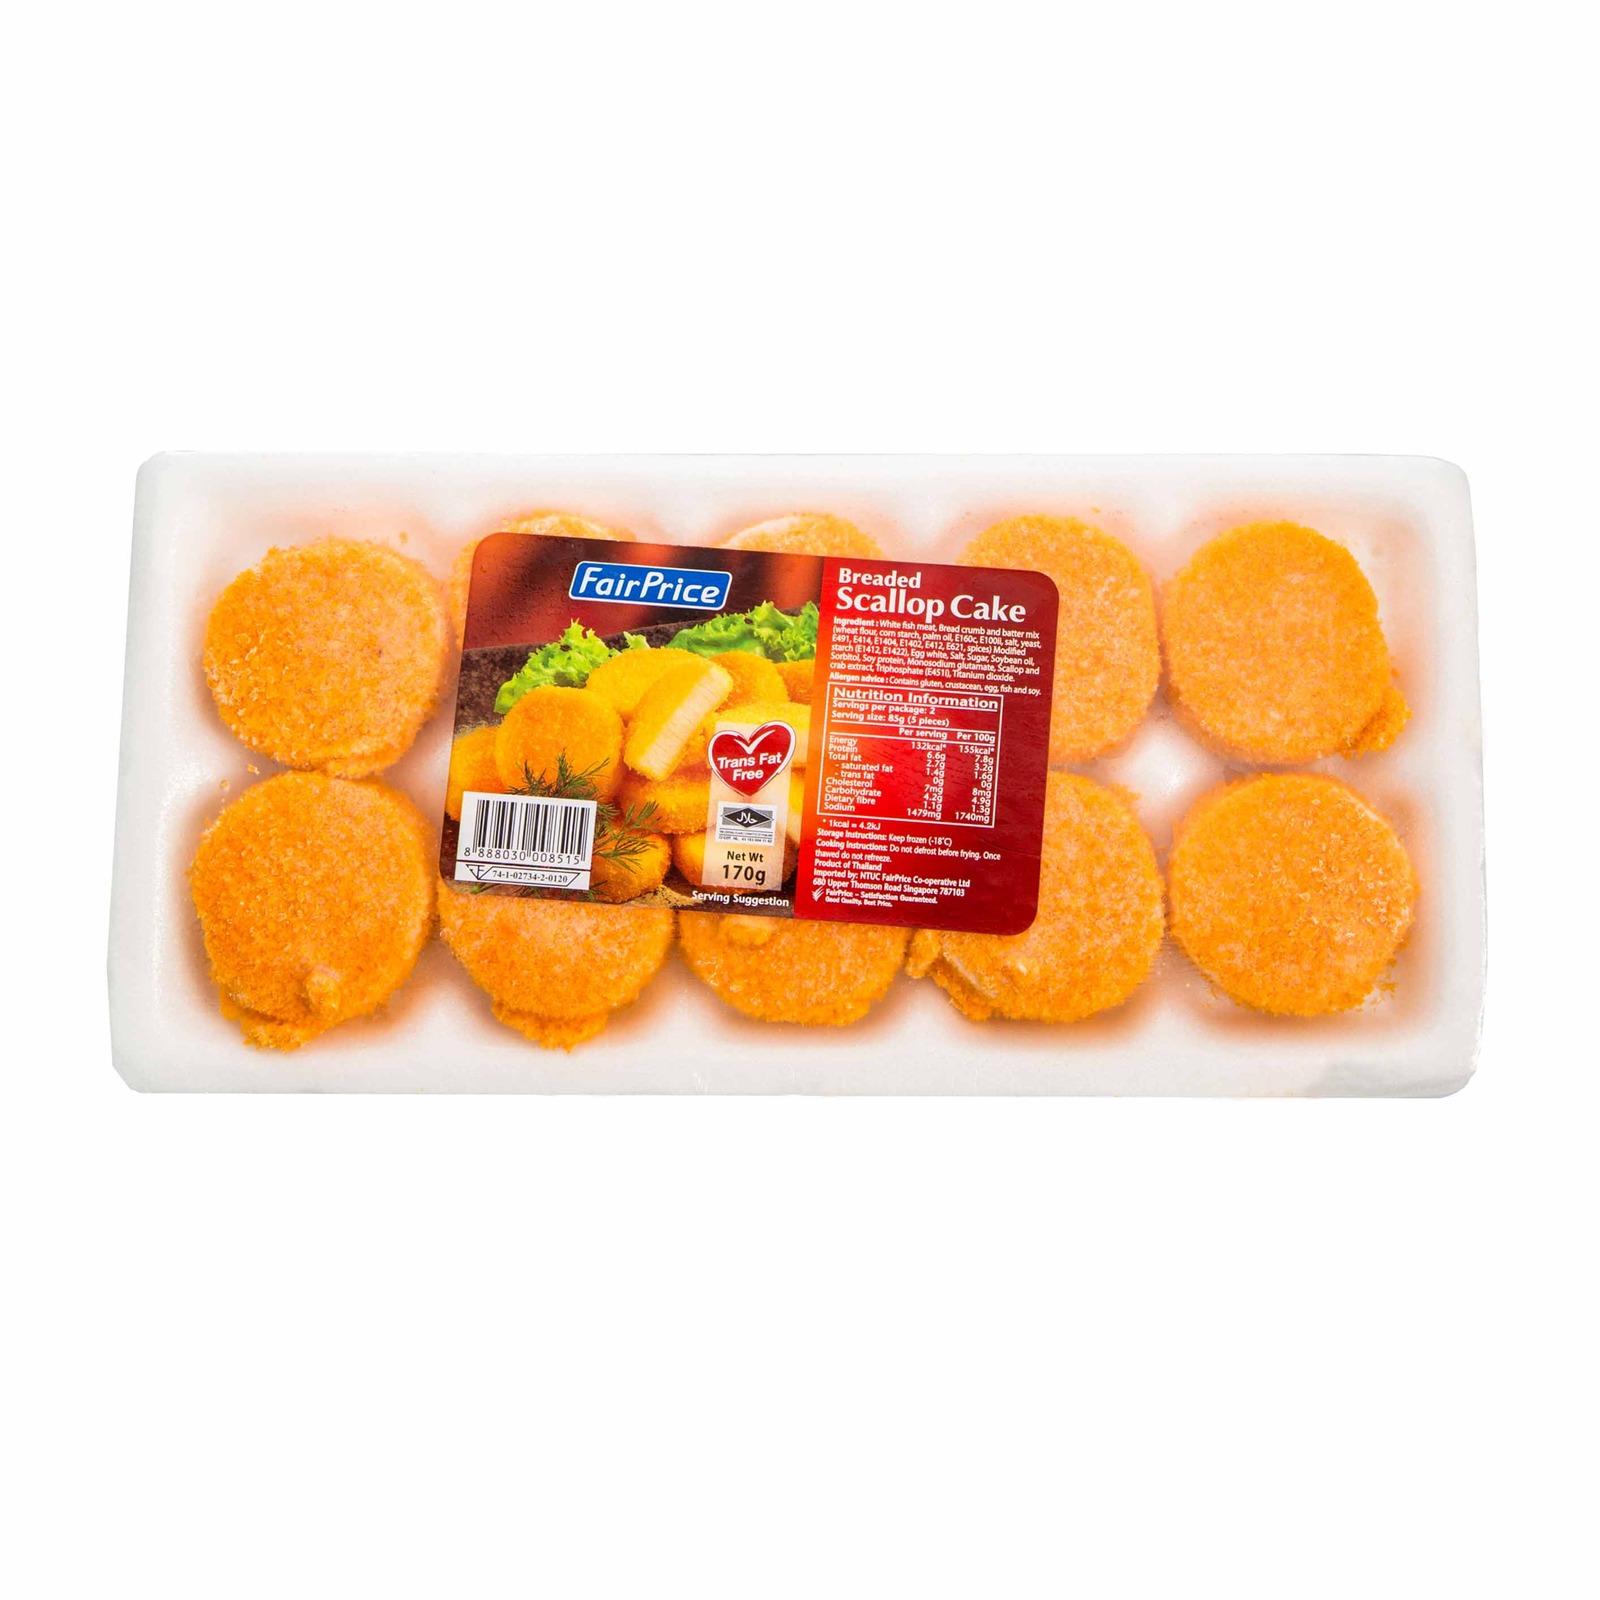 FairPrice Frozen Breaded Scallop Cakes